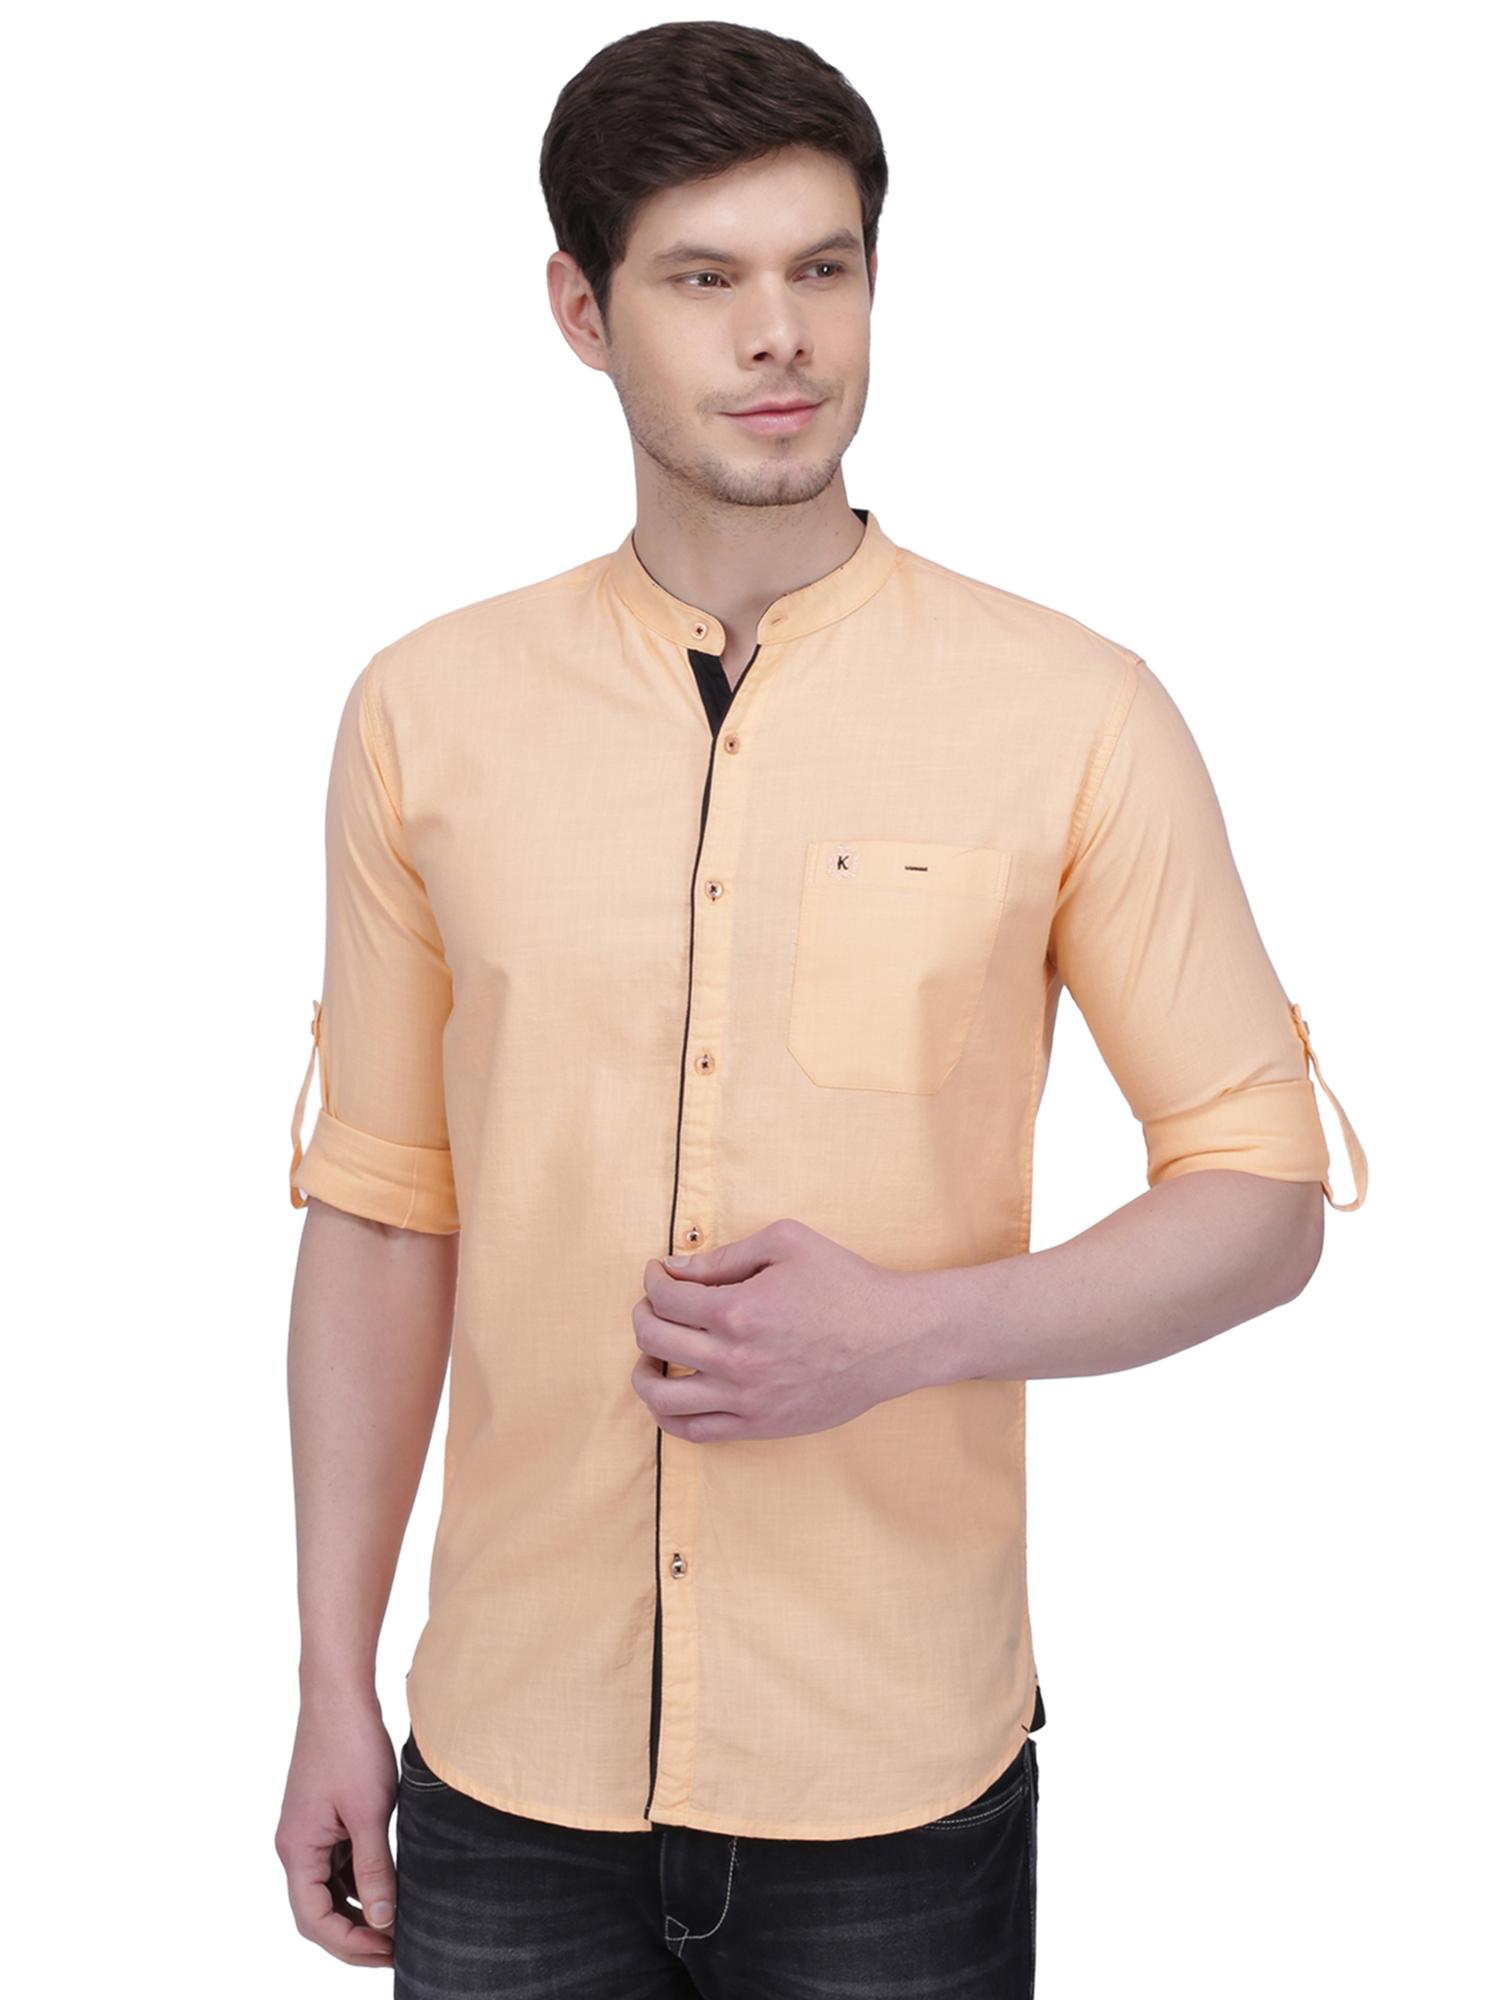 Kuons Avenue Men's Maroon Linen Cotton Casual Shirt- KACLFS1298PE